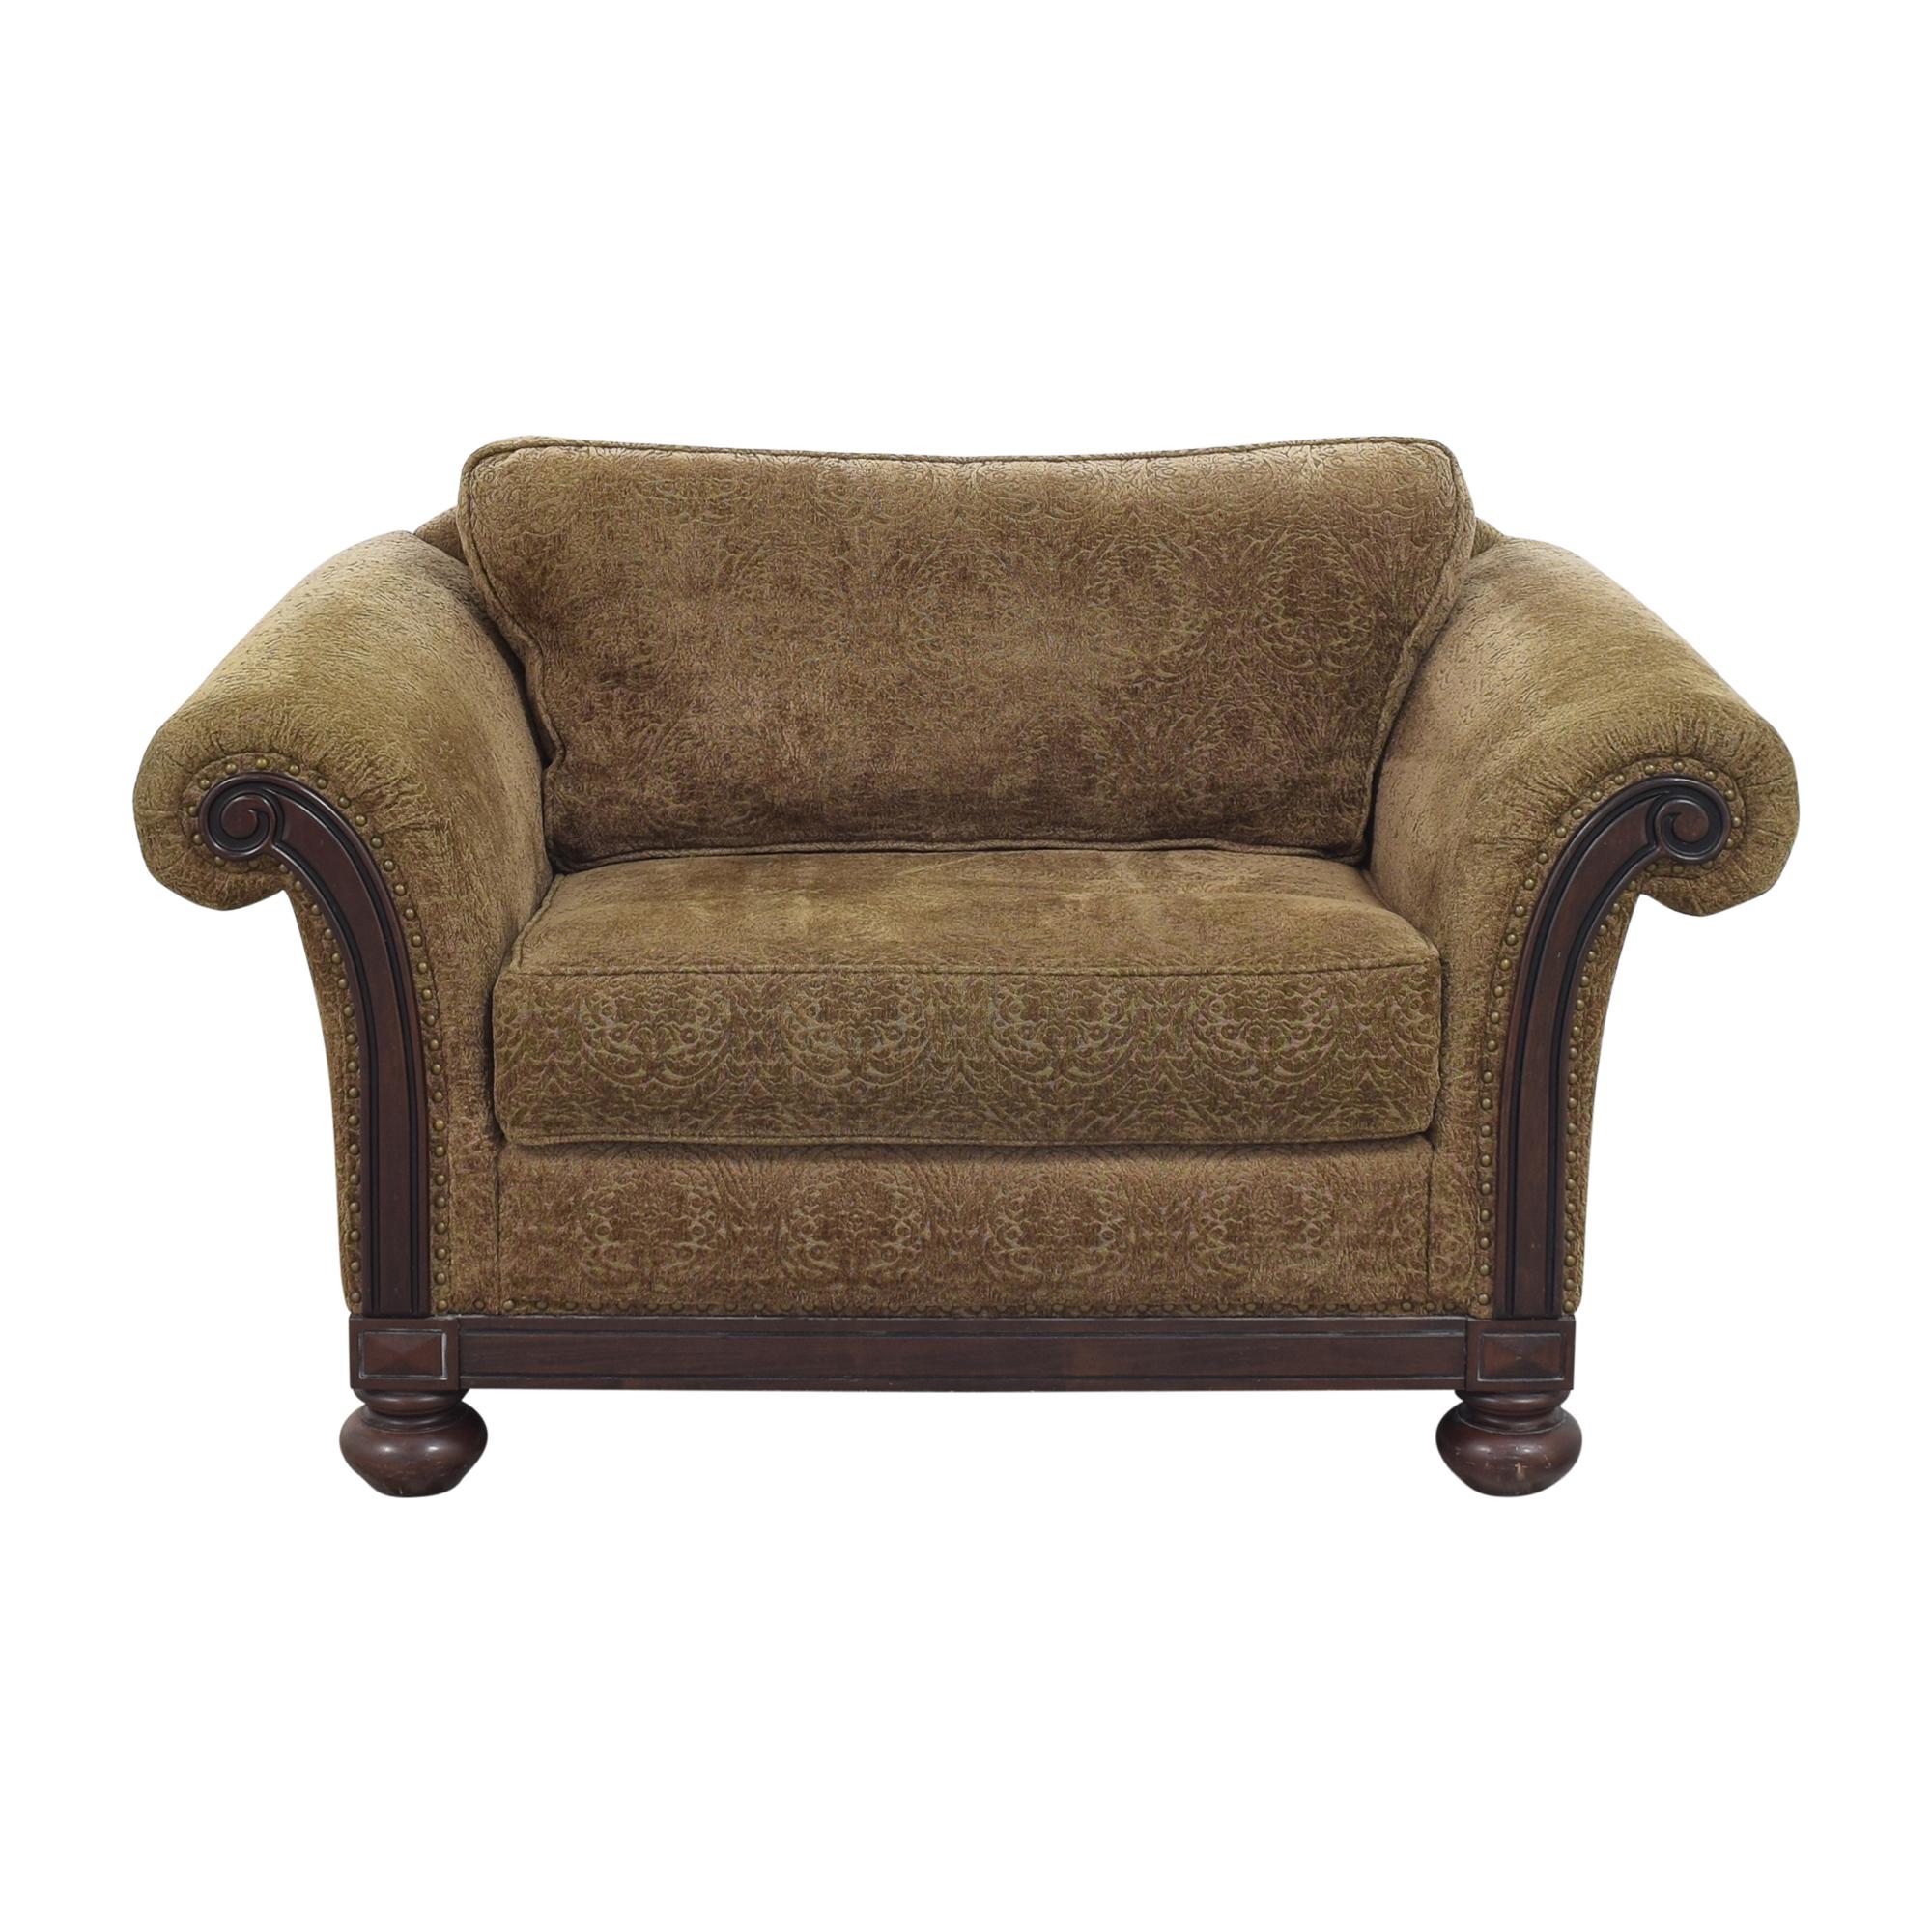 Bernhardt Bernhardt Roll Arm Chair and a Half discount